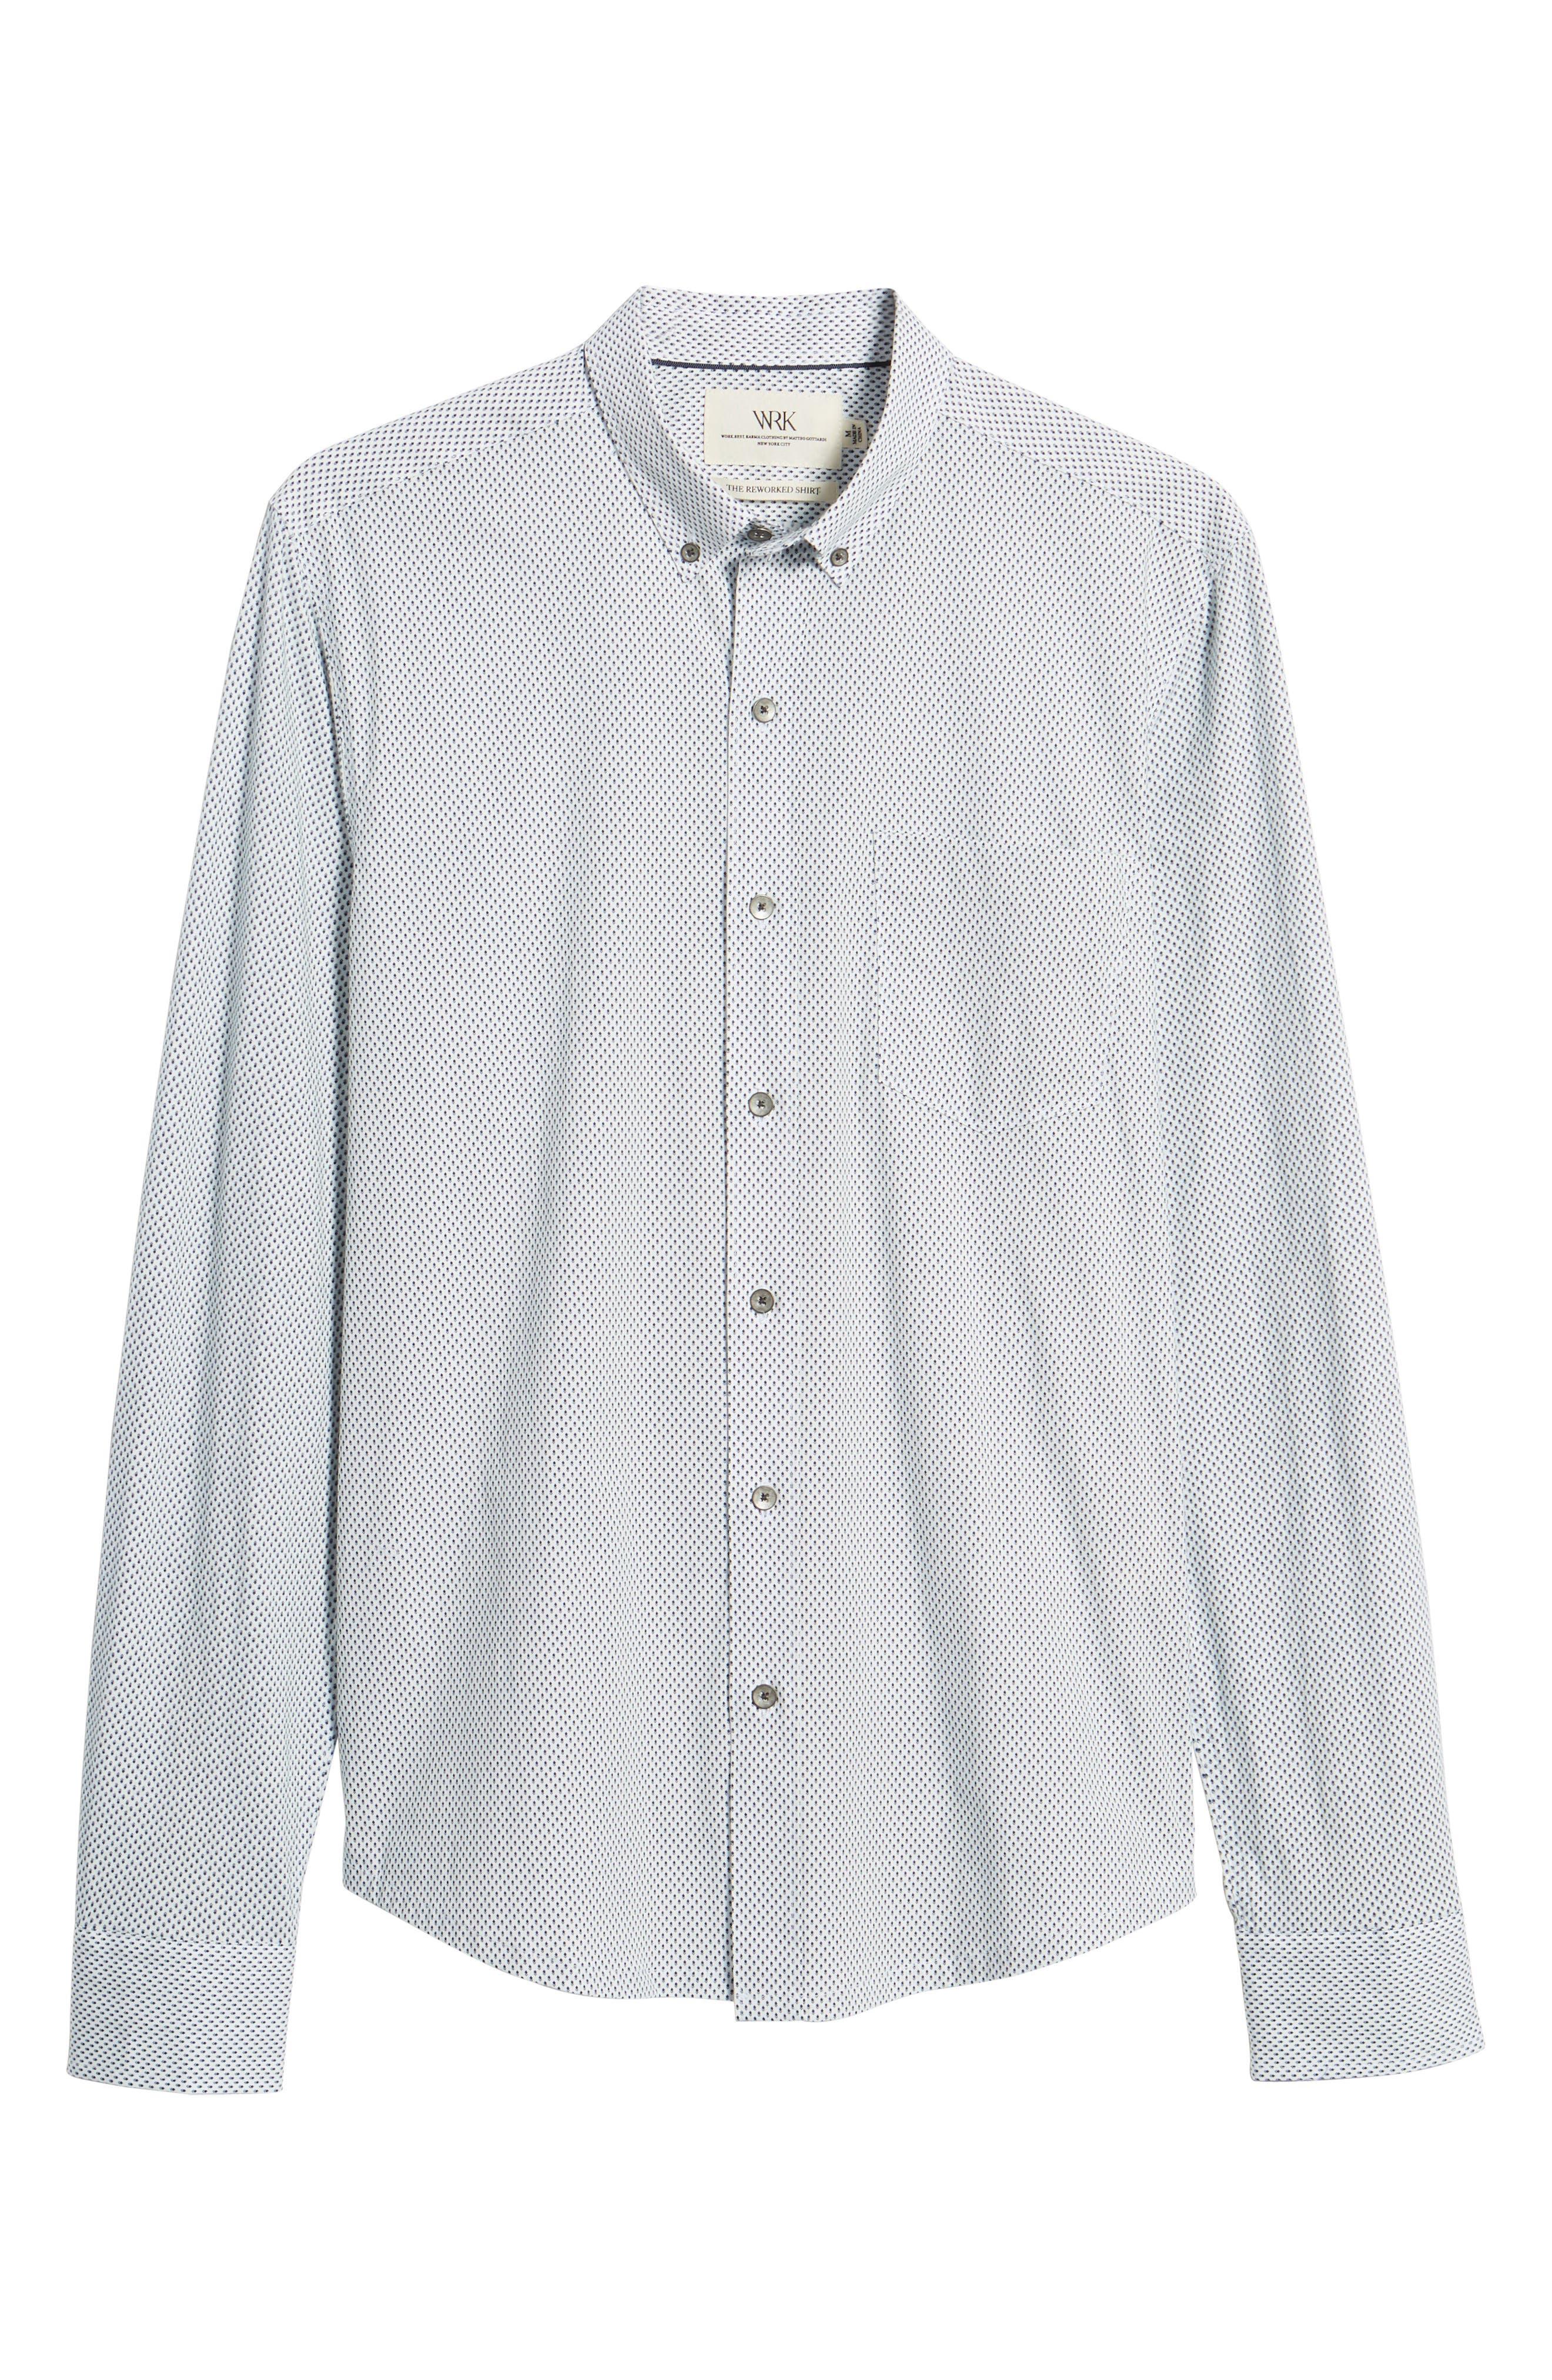 Reworked Slim Fit Diamond Print Sport Shirt,                             Alternate thumbnail 6, color,                             White/ Navy